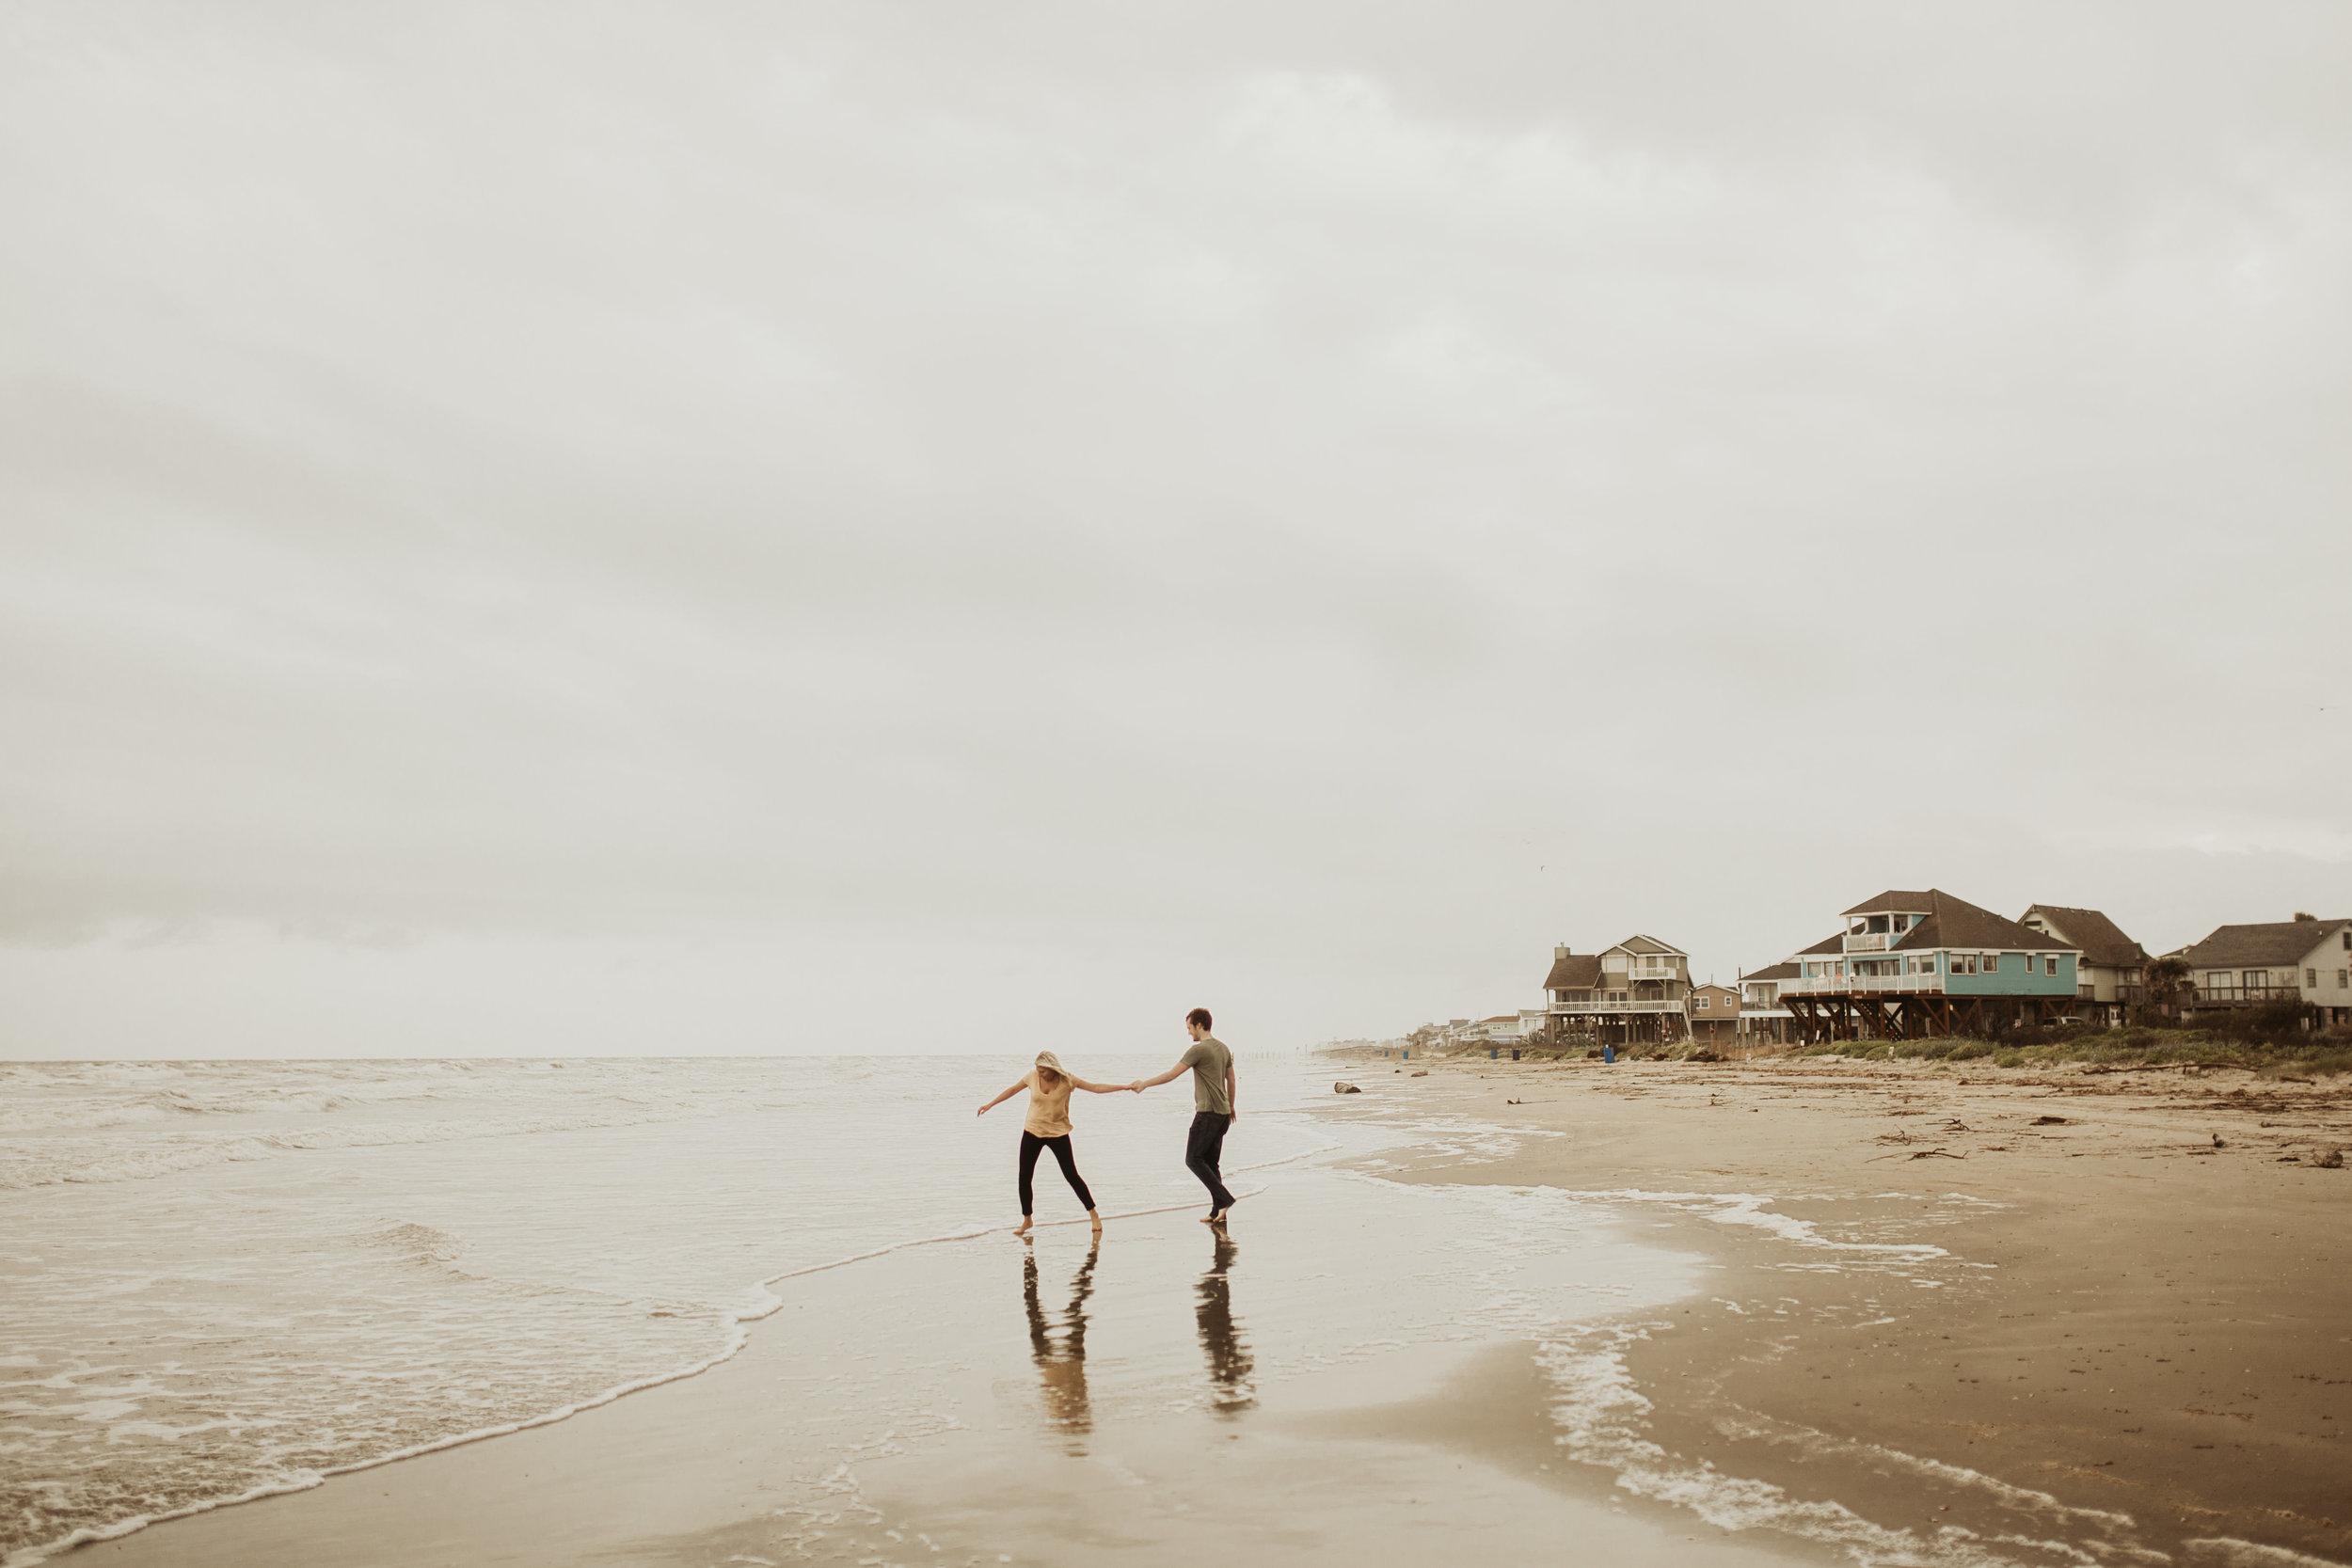 oceanside-california-hawaii-wedding-photographer06.jpg